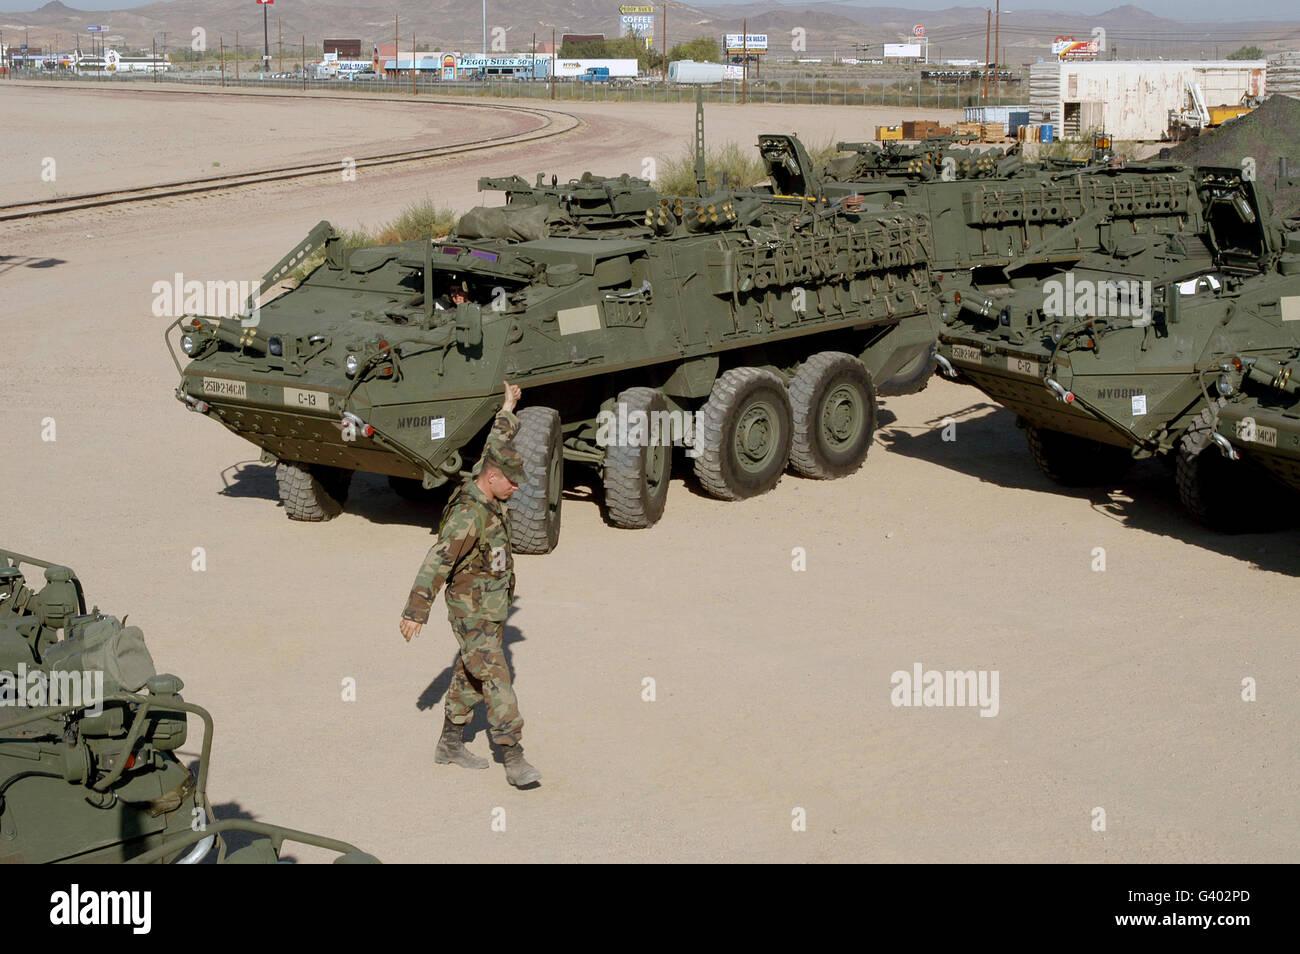 M1127 Stryker Reconnaissance Vehicles. - Stock Image